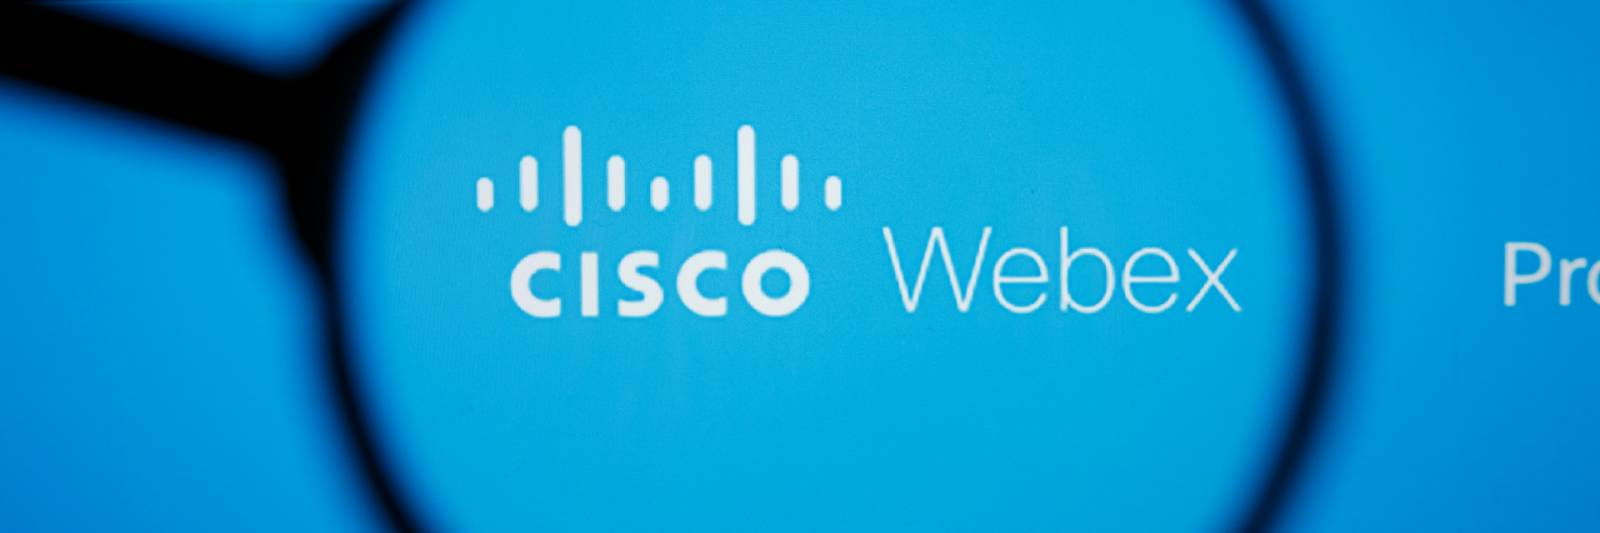 Former Cisco Engineer Gets 2 Year Prison Sentence For Webex Hack